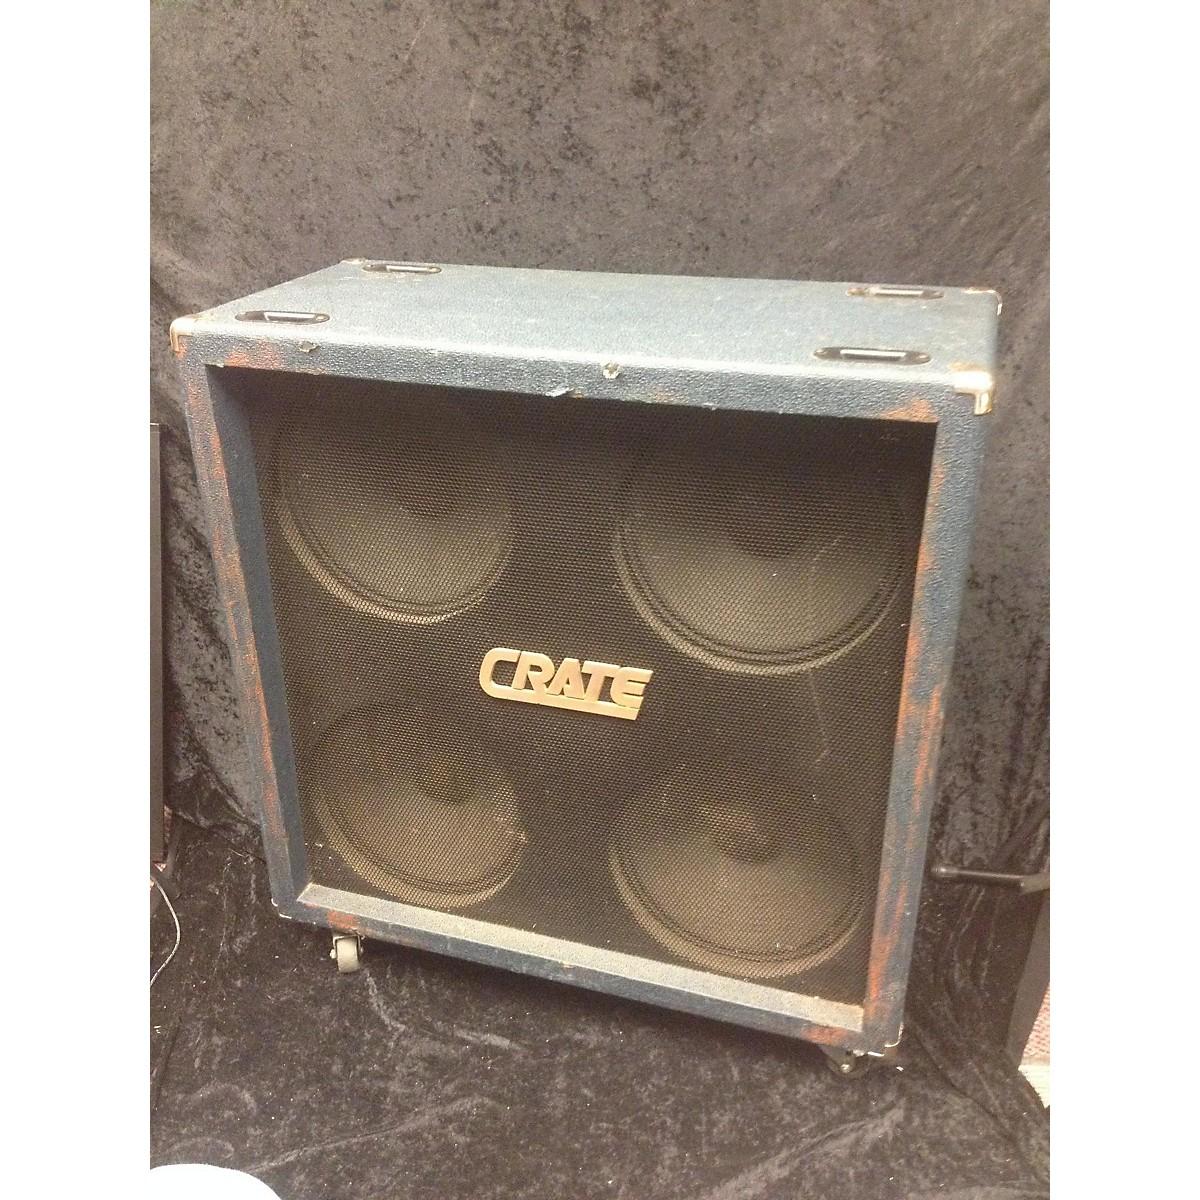 Crate Bv412r Guitar Cabinet